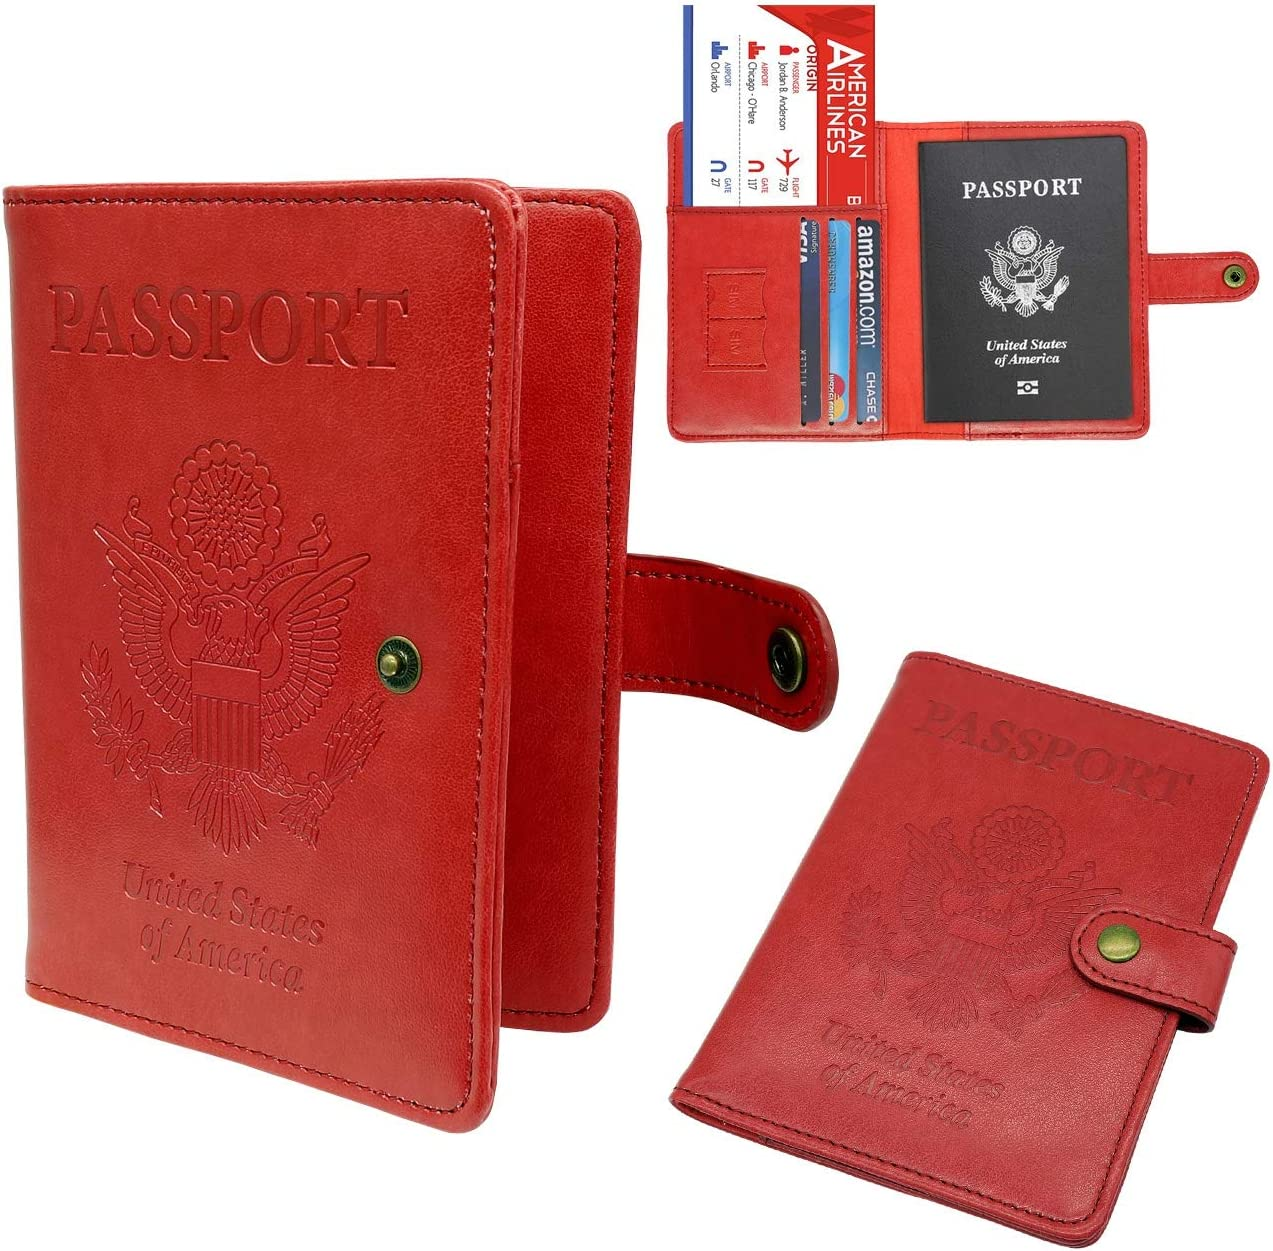 Passport Holder Cover Wallet RFID Blocking Leather Card Case Travel Wallet